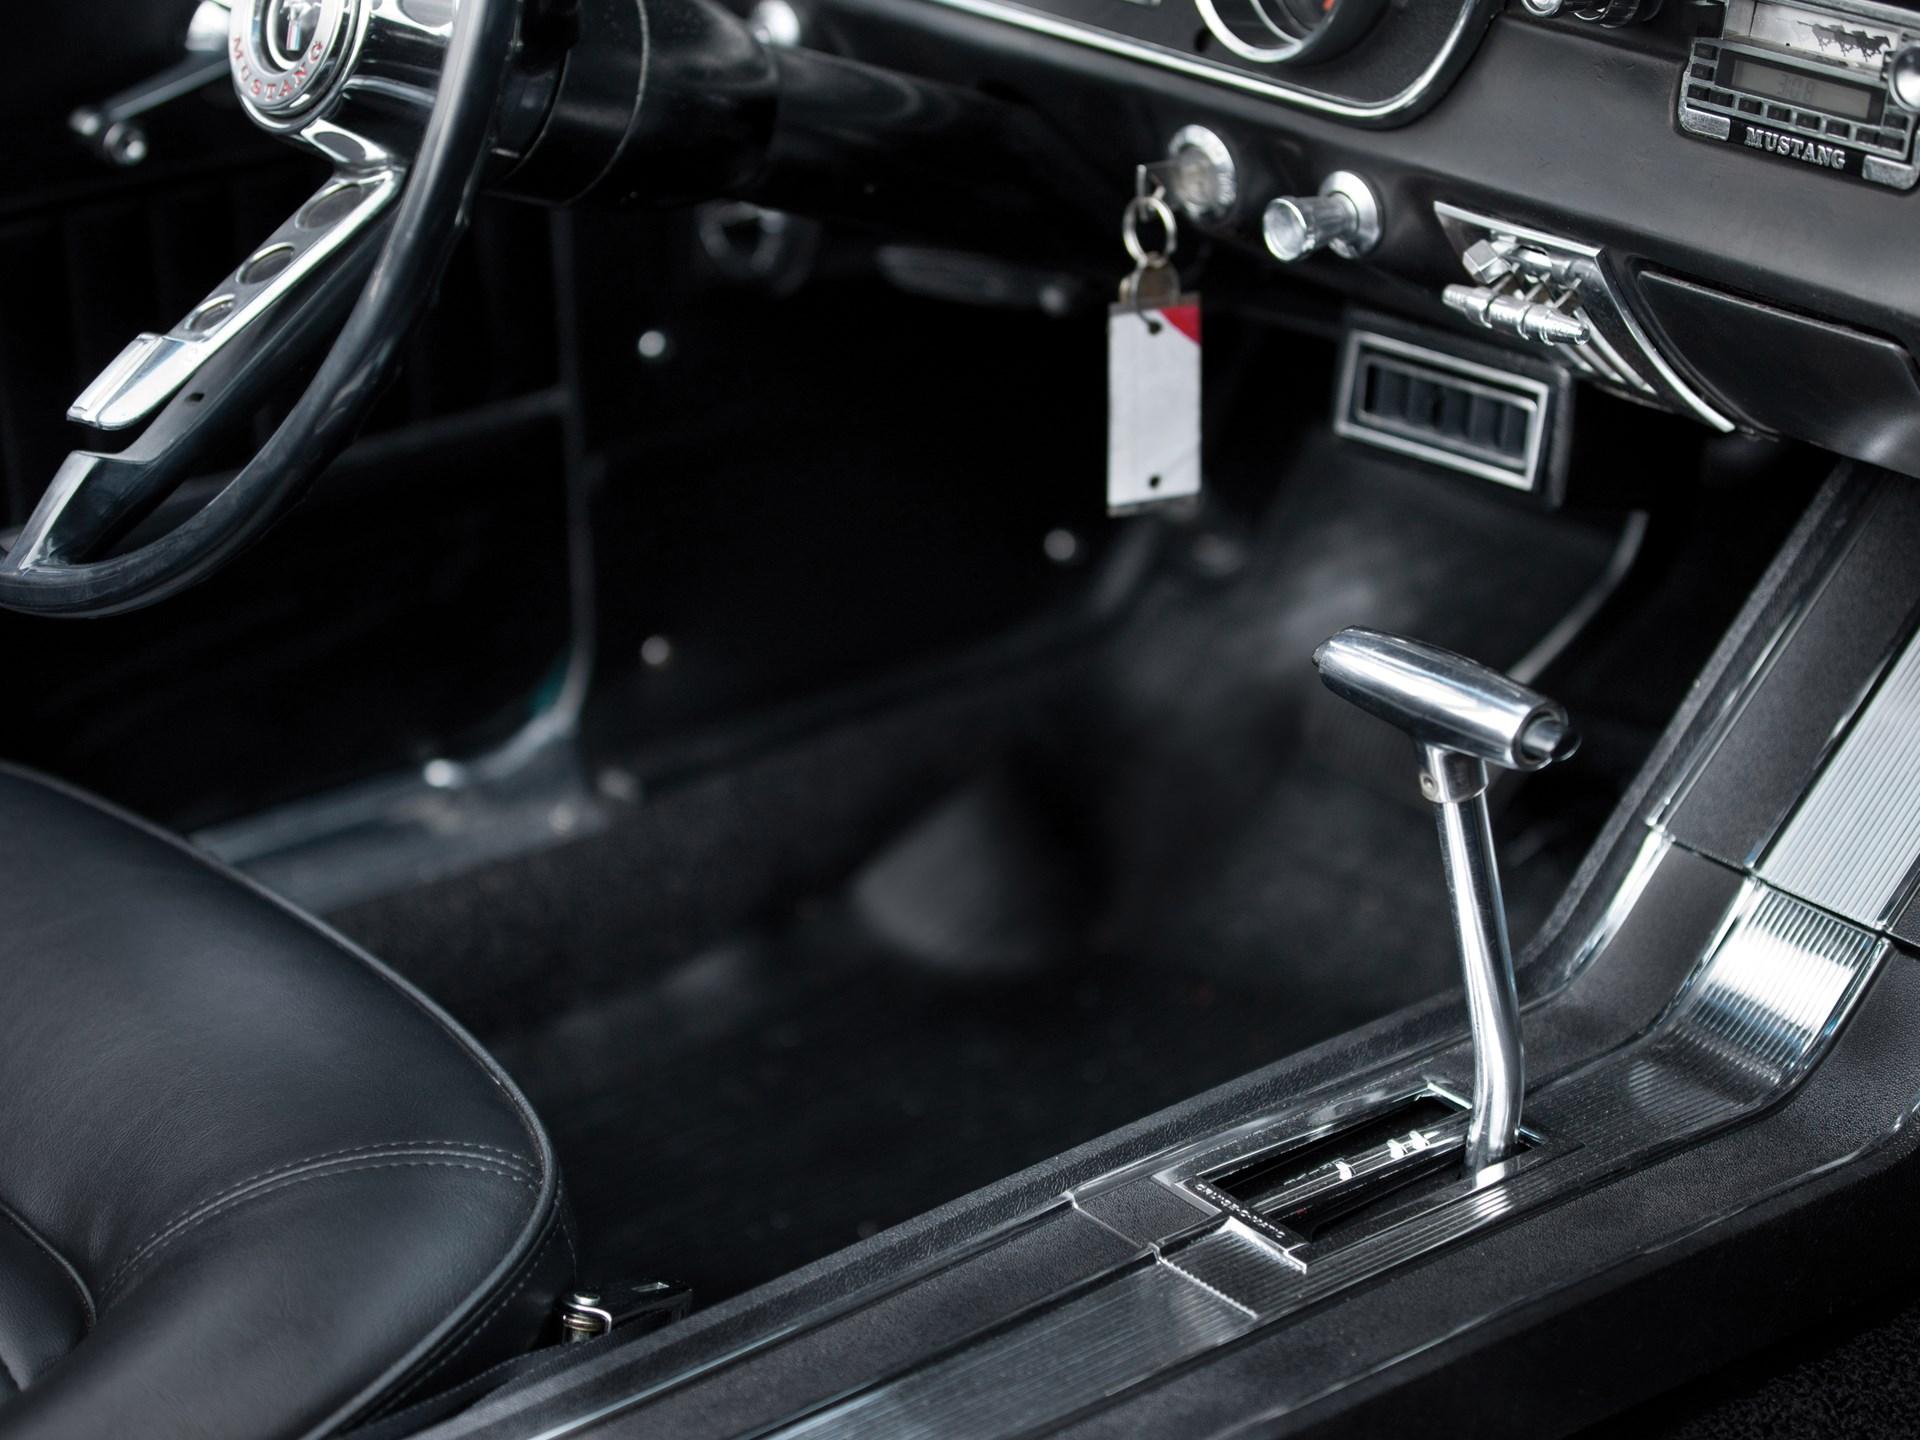 1965 Ford Mustang Interior